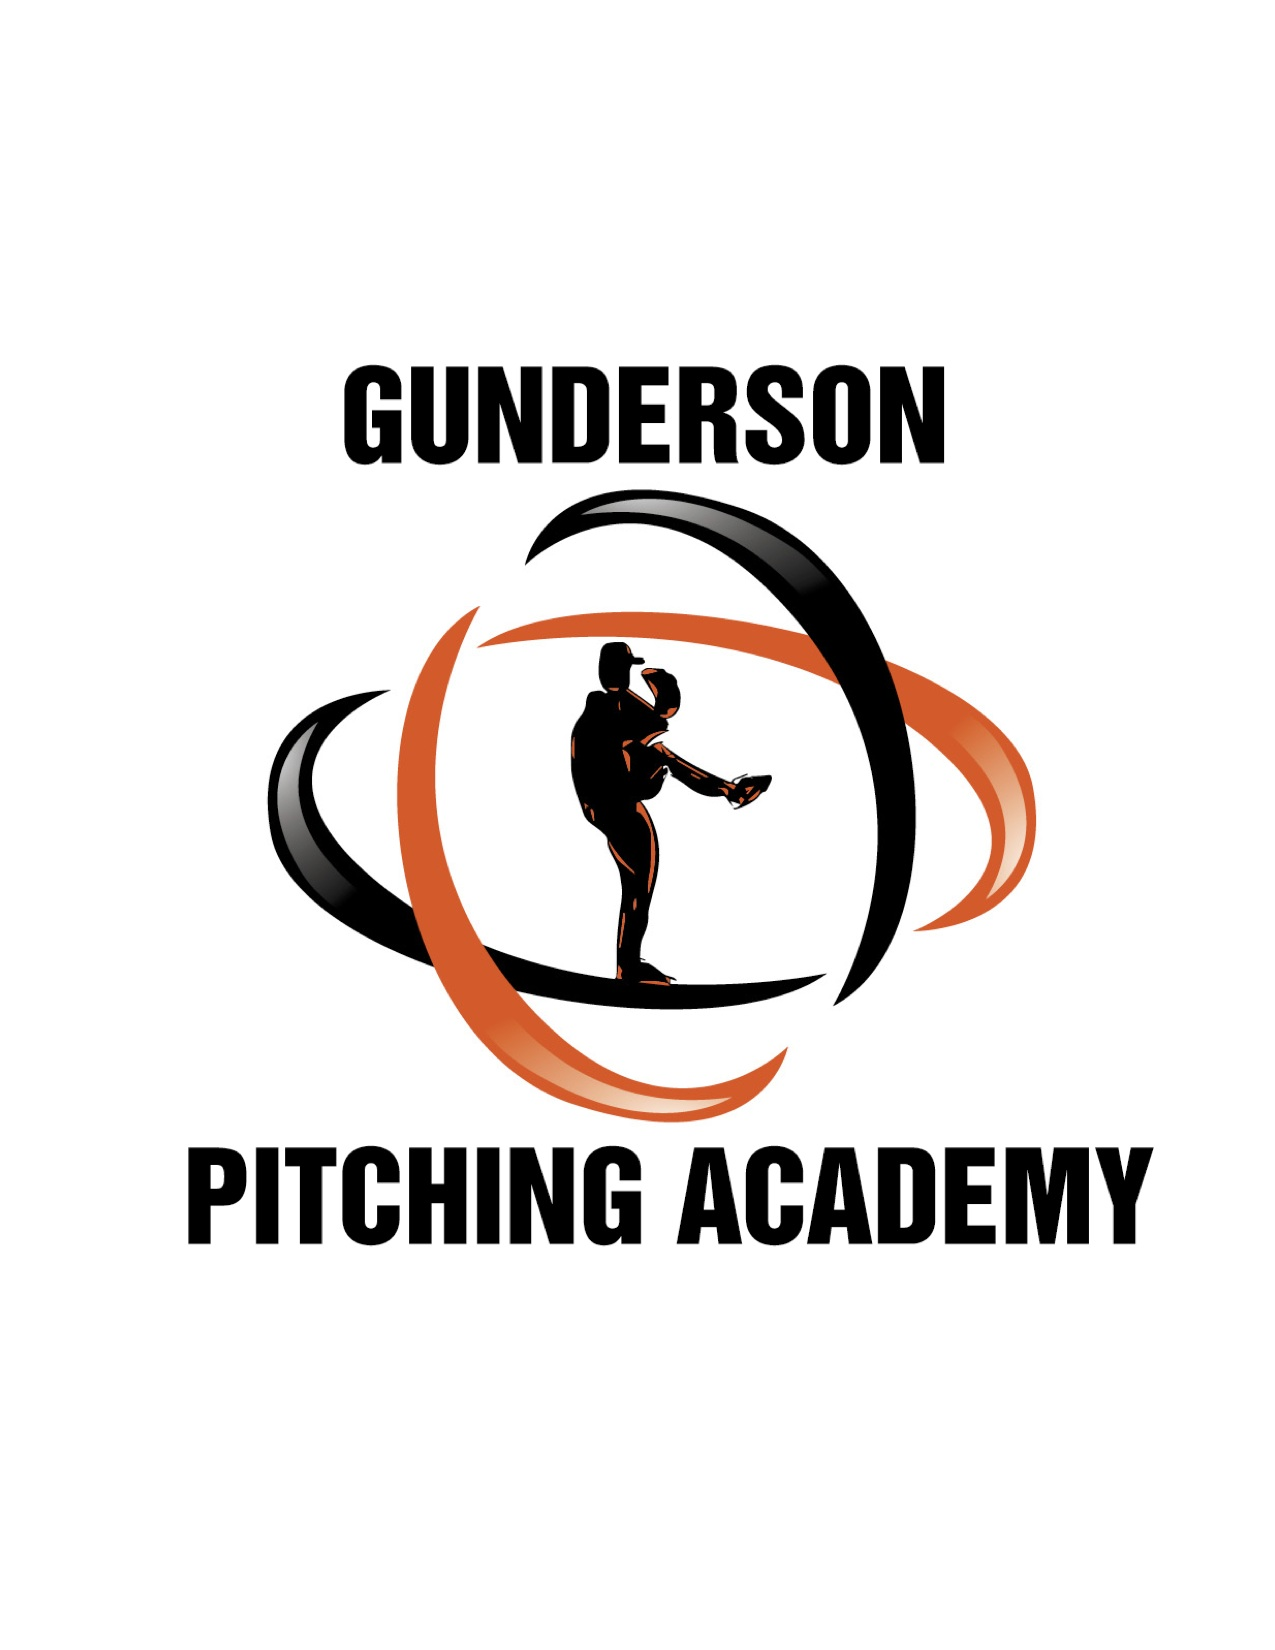 Gunderson Pitching Academy.jpg